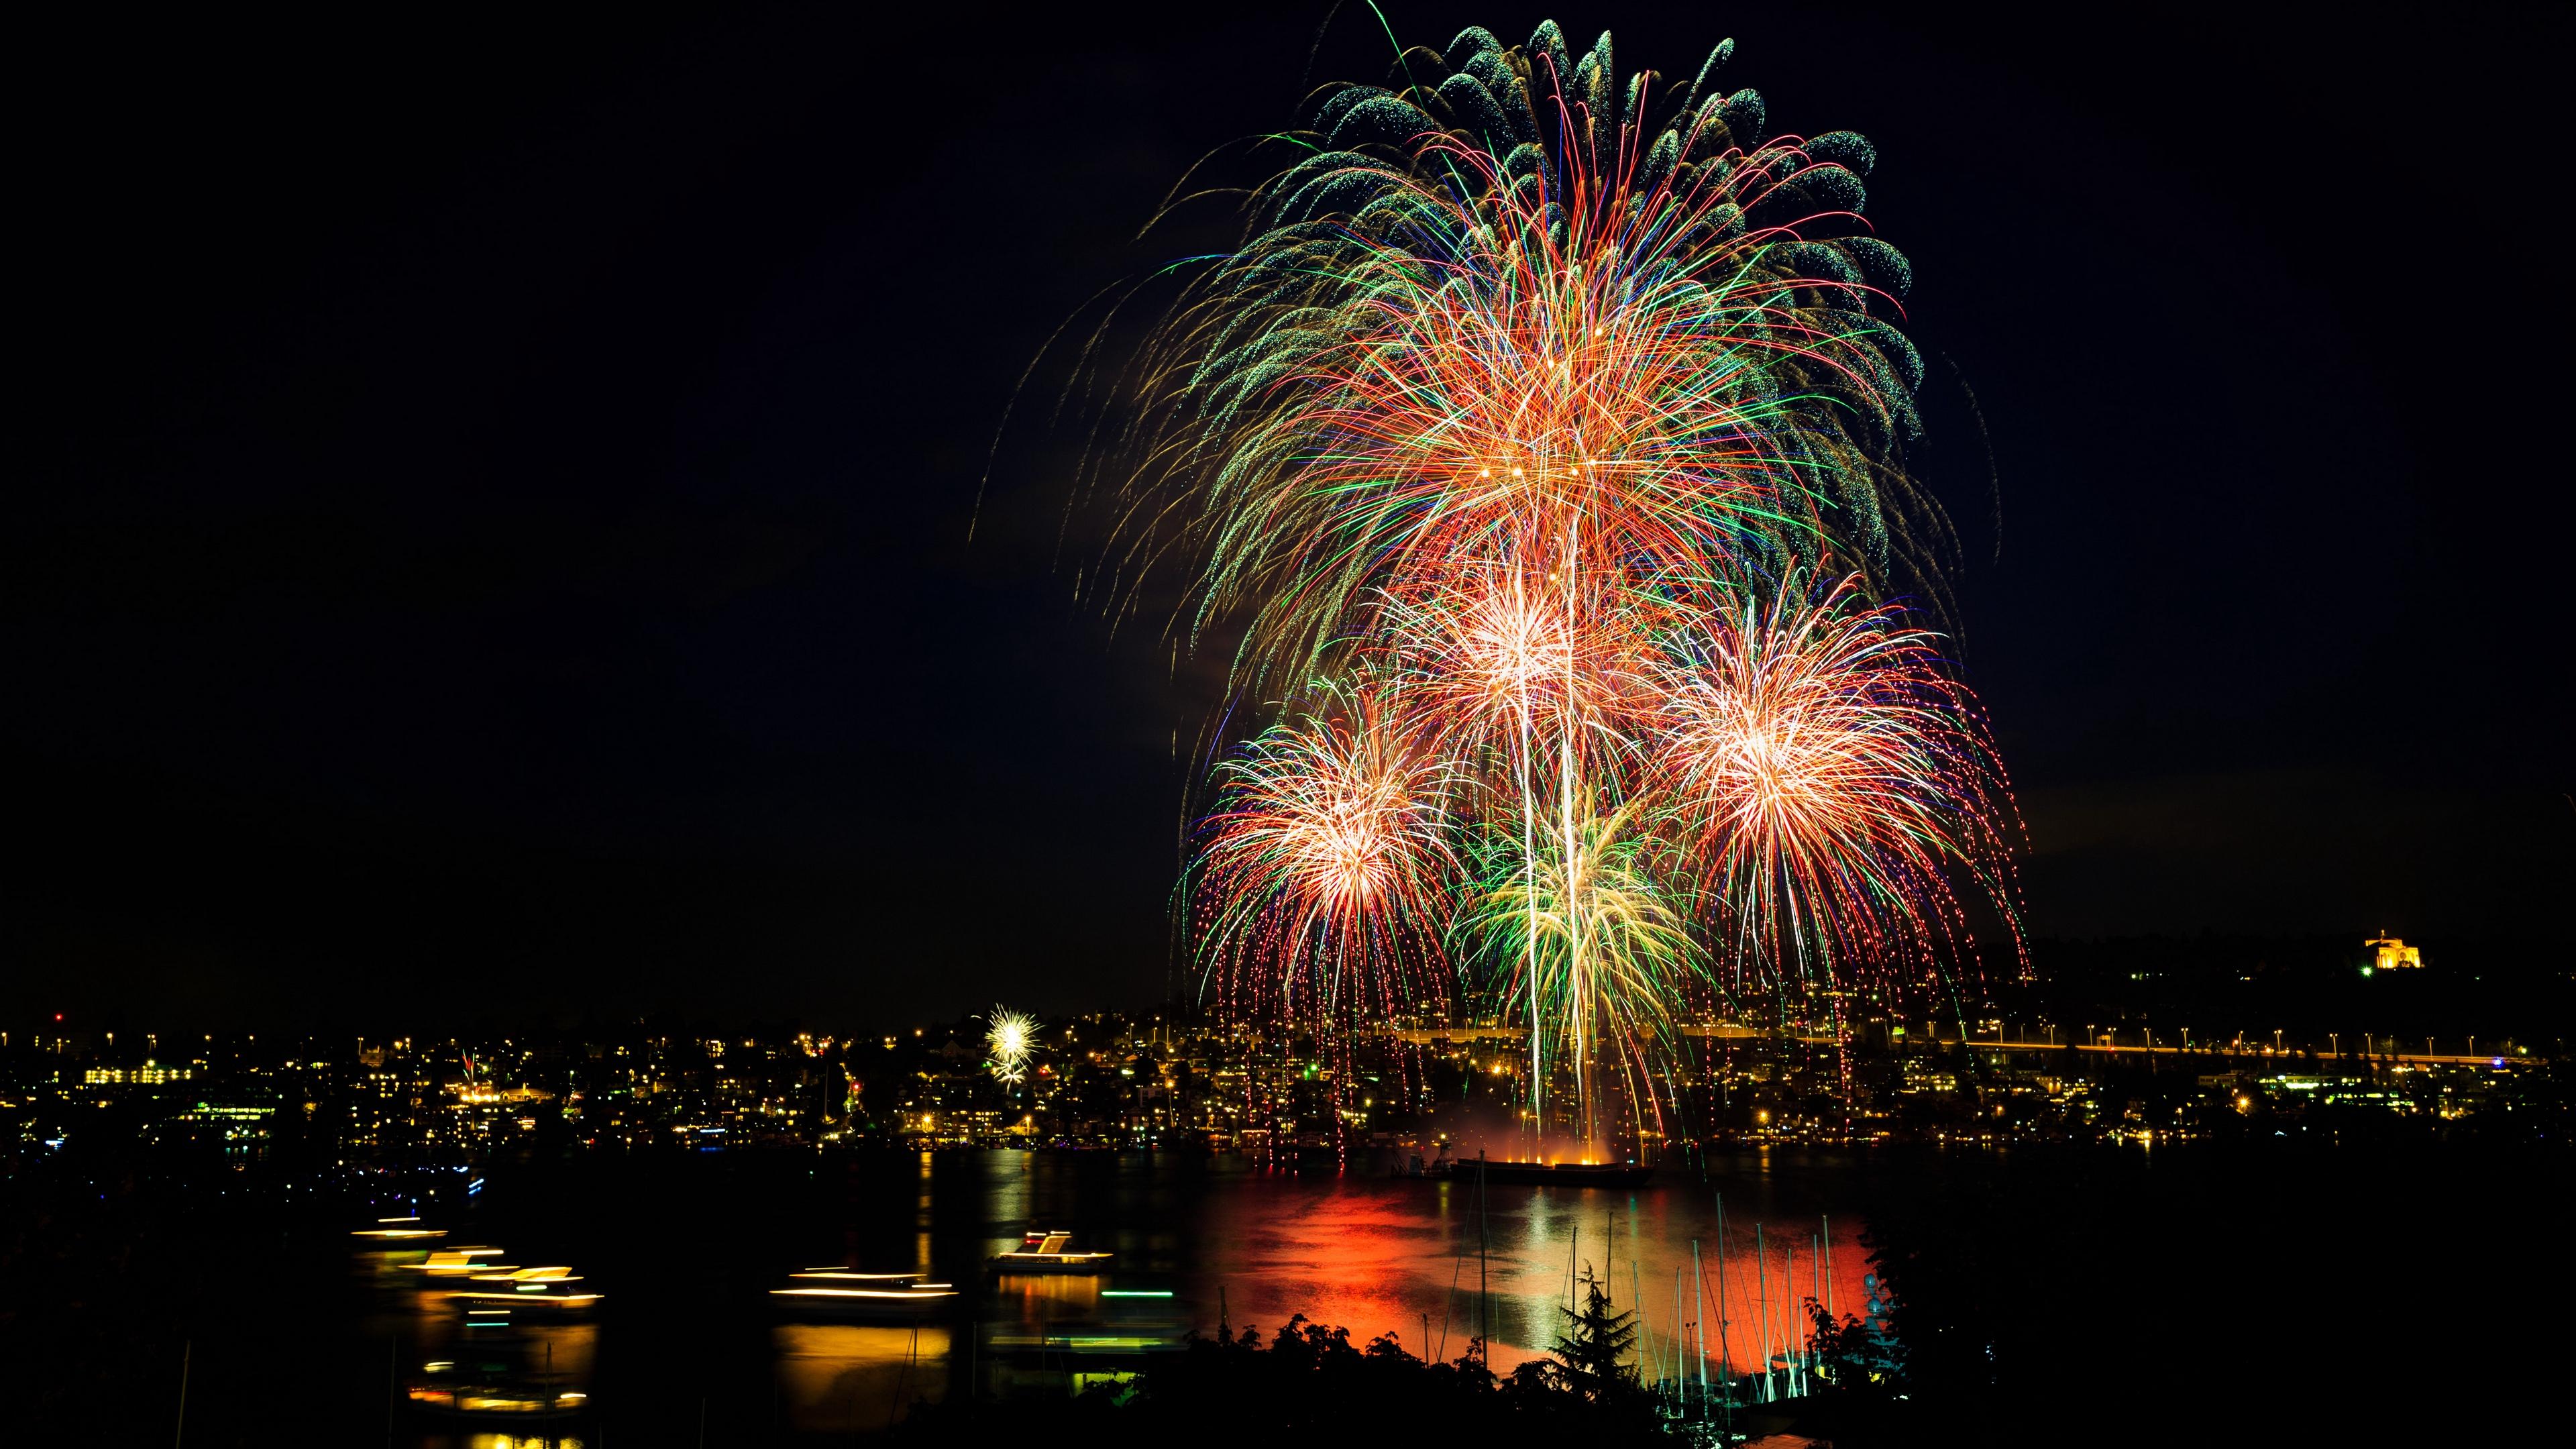 salute fireworks night city city lights seattle 4k 1538067578 - salute, fireworks, night city, city lights, seattle 4k - salute, night city, Fireworks